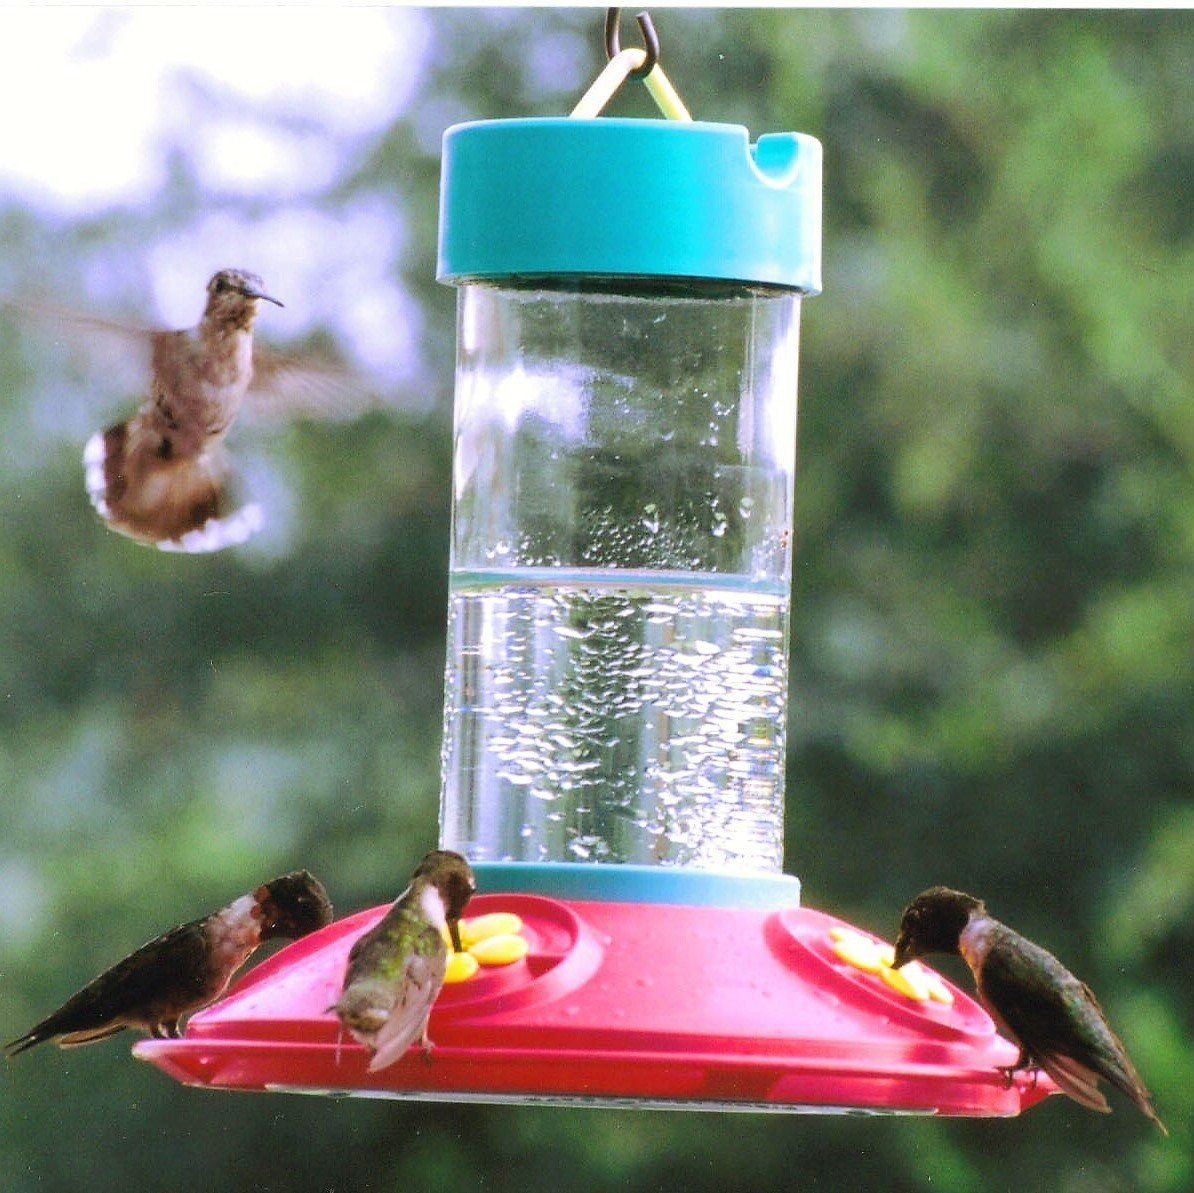 Dr jbs original 16 oz clean hummingbird feeder humming